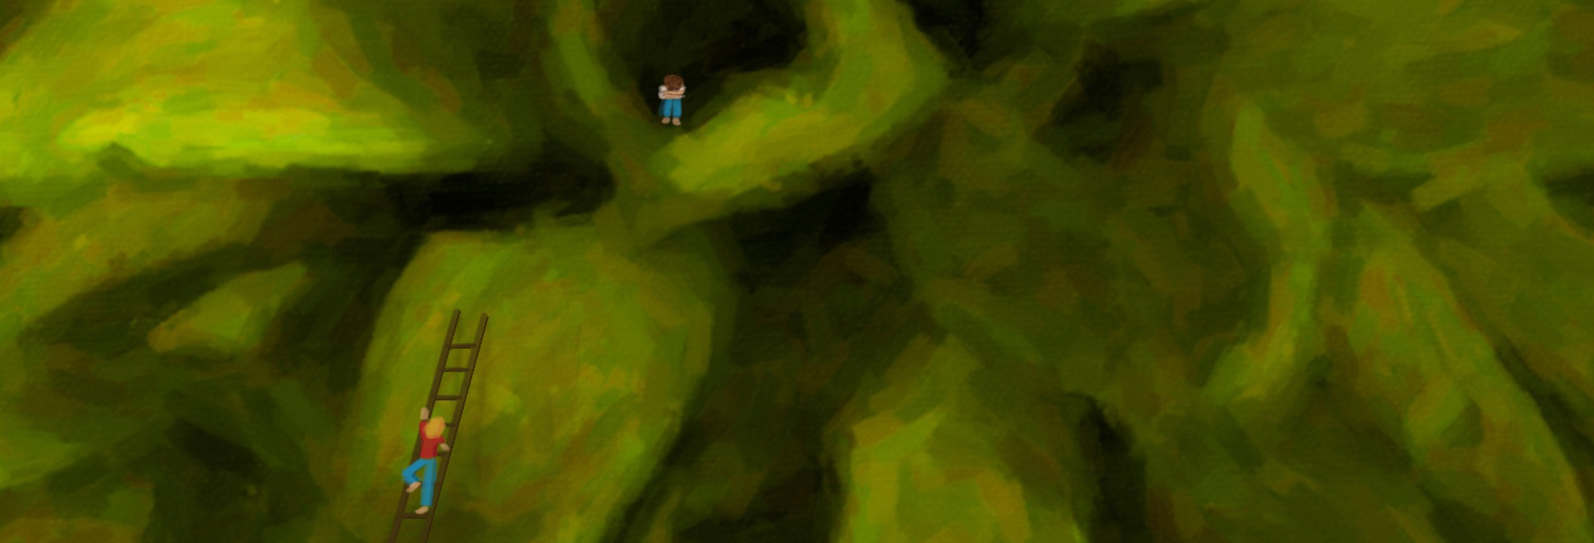 HQ groene bergen small 111969363533